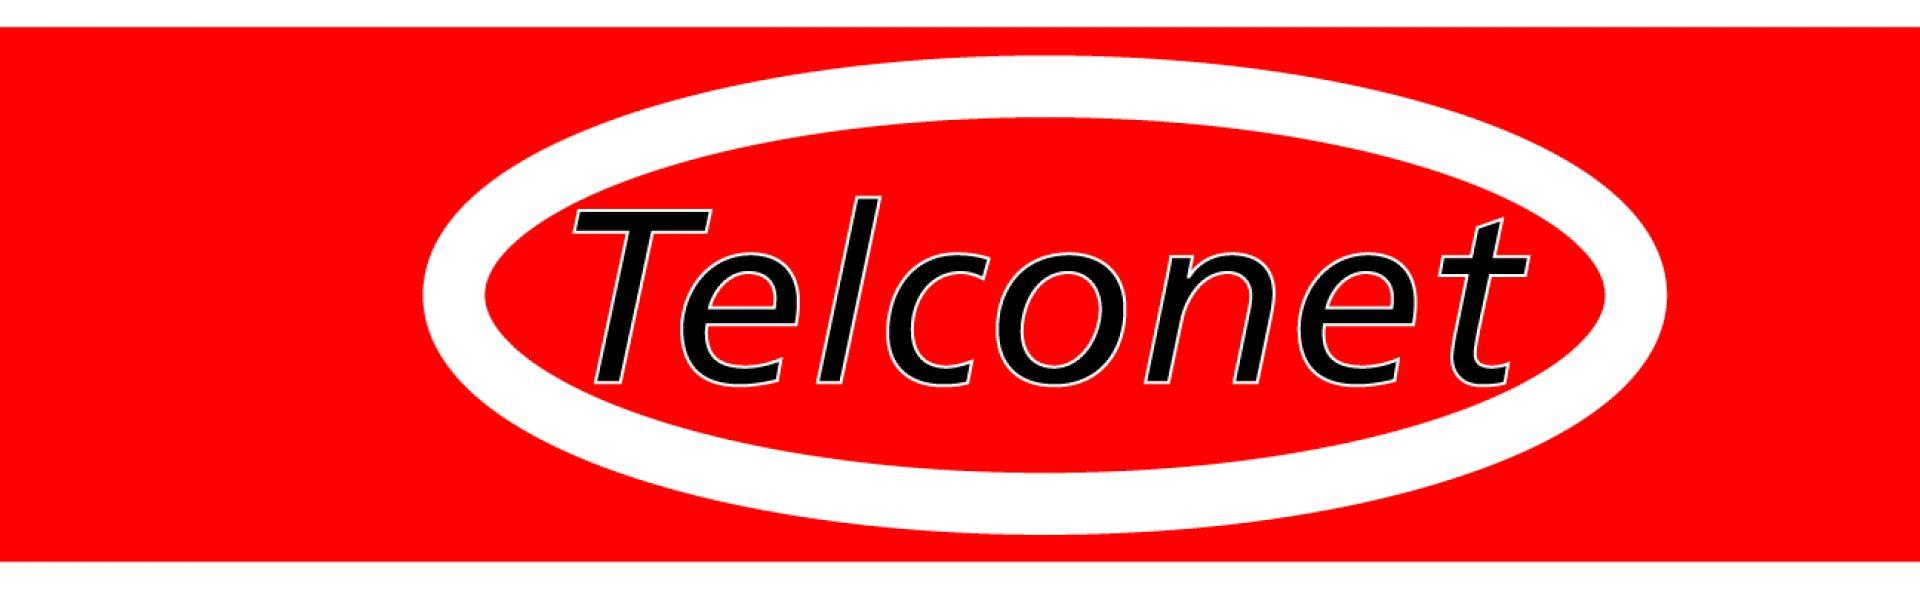 TELCONET